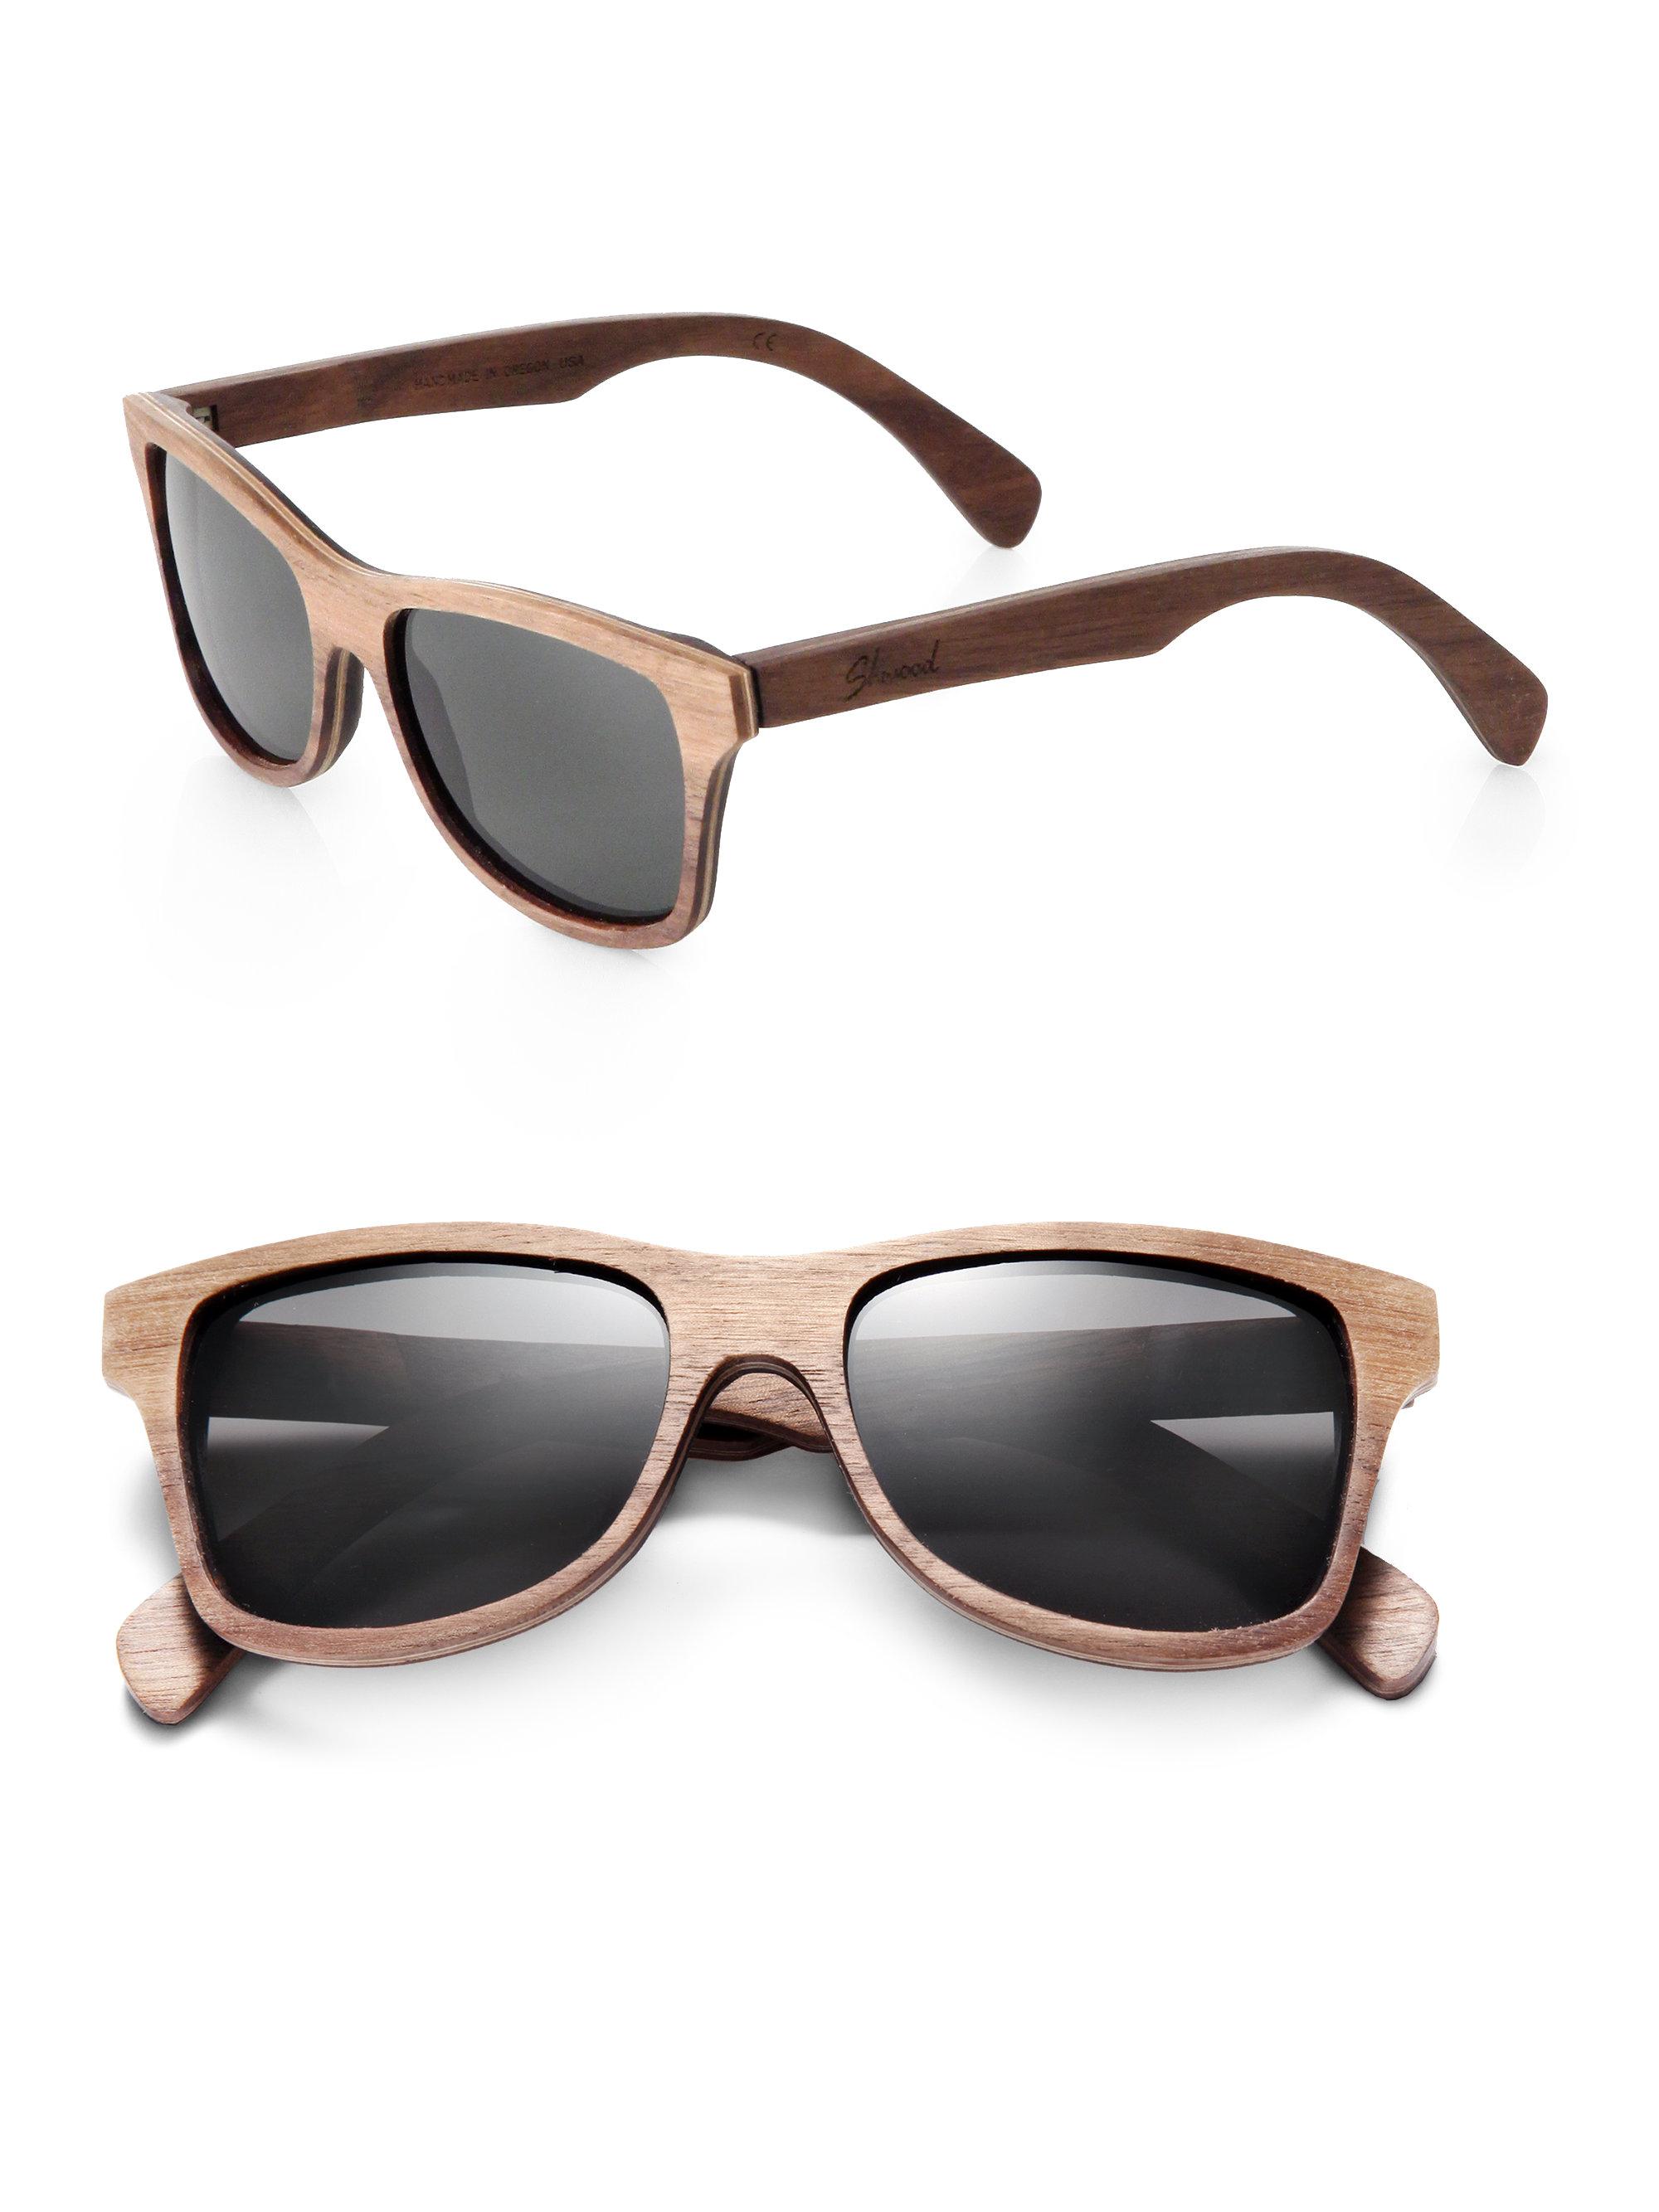 Wood Frame Wayfarer Sunglasses